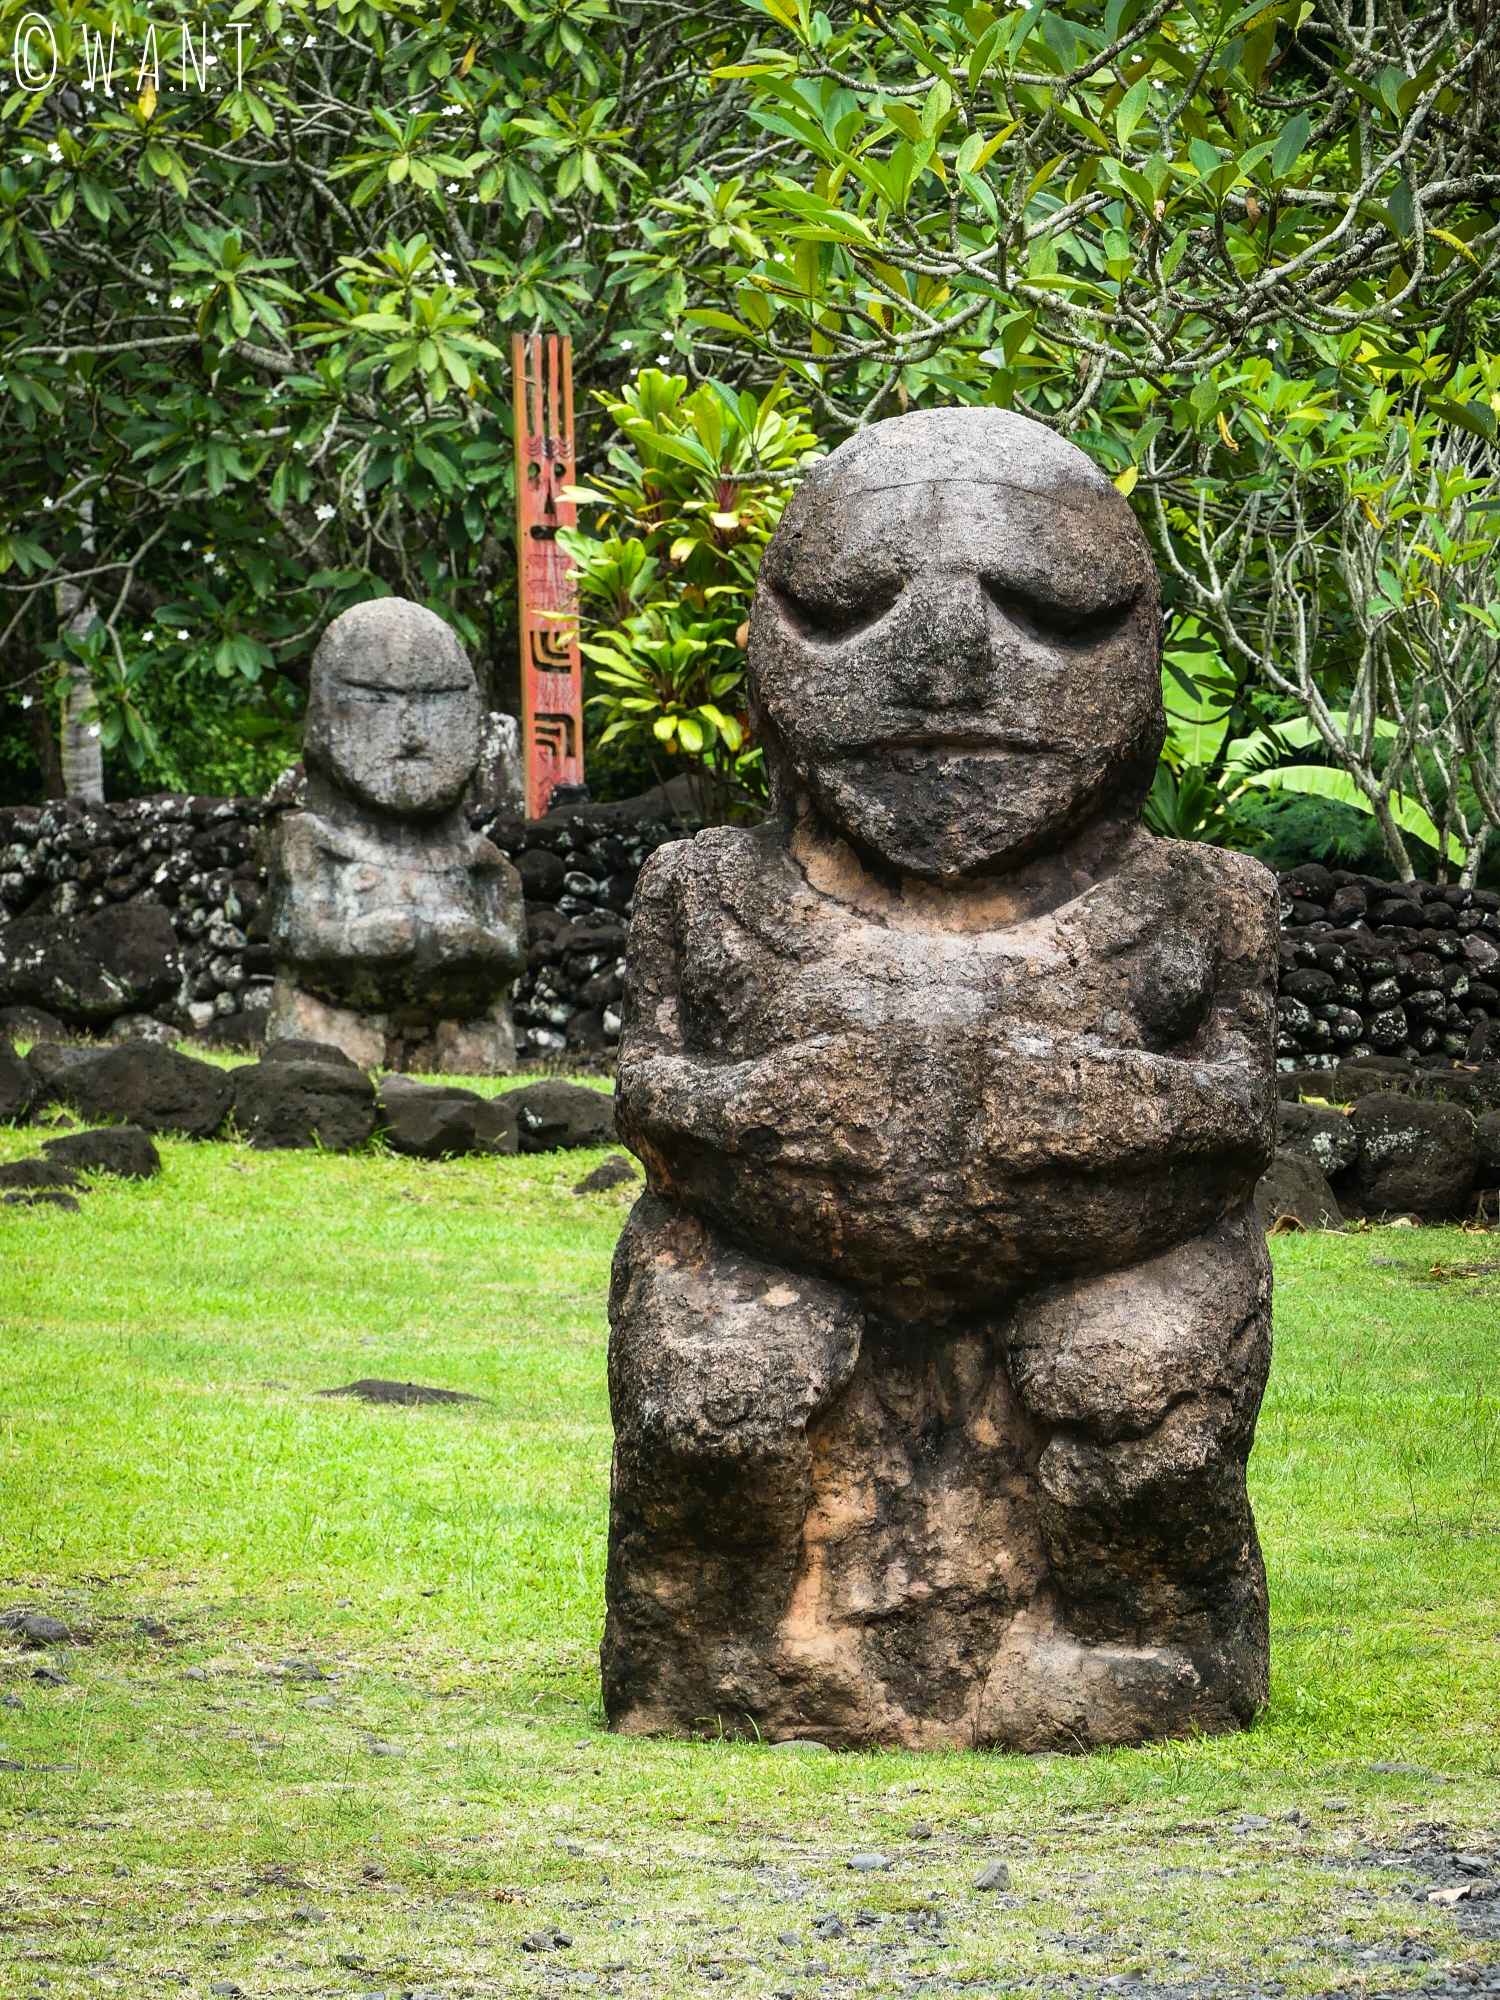 Tiki, statue représentant un homme-dieu, au Marae Arahurahu de Tahiti